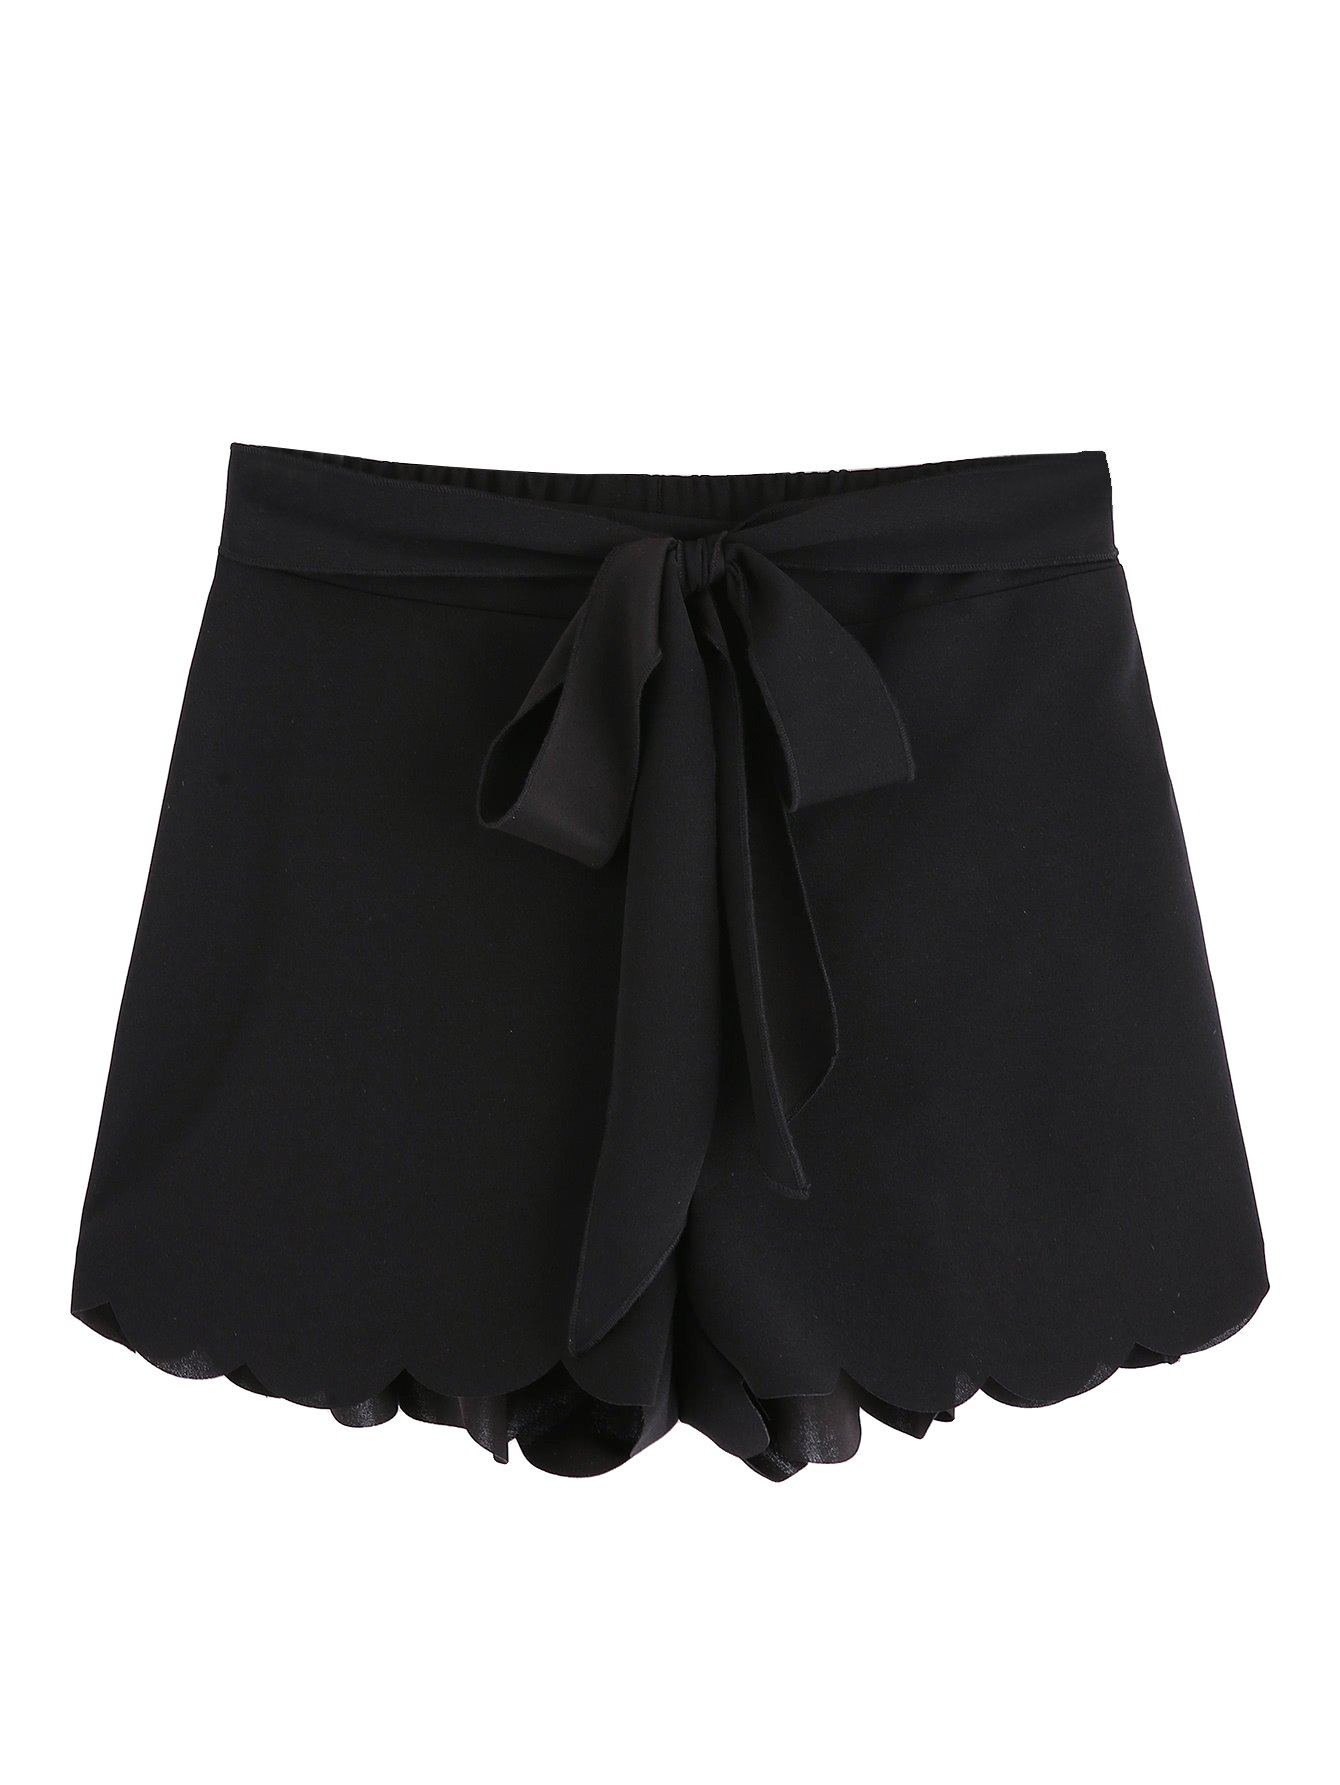 MakeMeChic Women's Casual Elastic Waist Scalloped Summer Shorts Black L